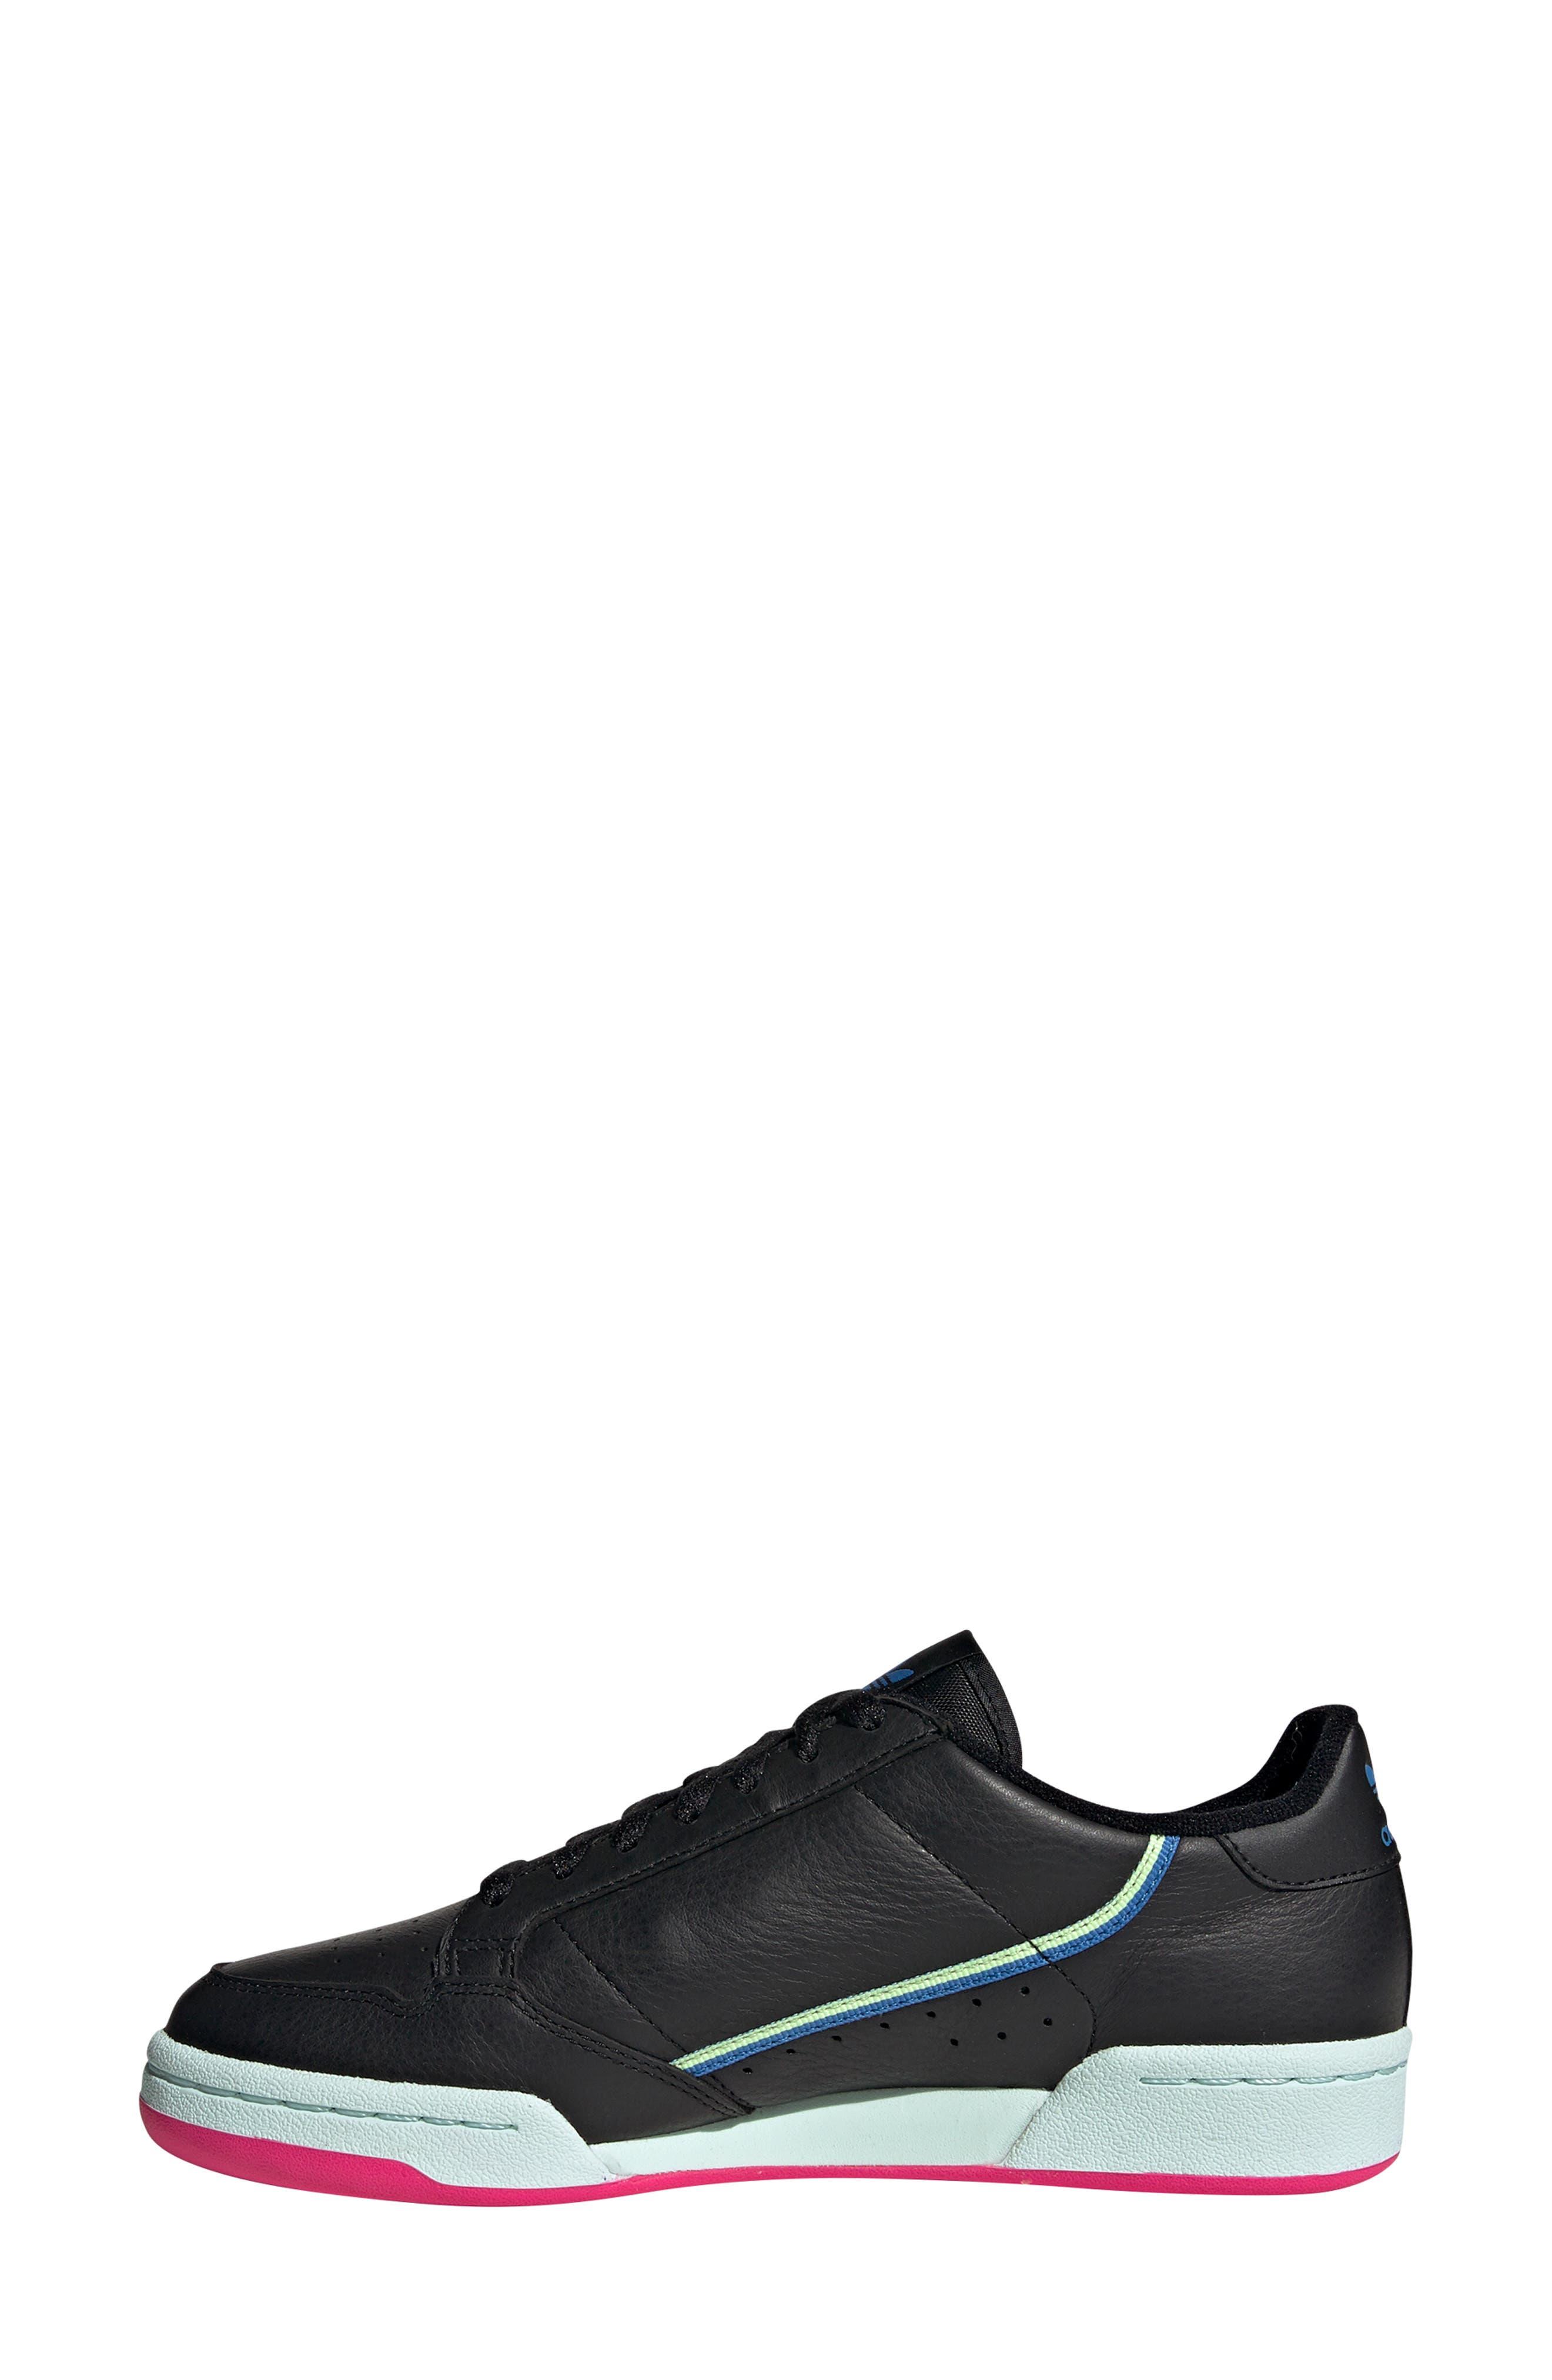 ADIDAS,                             Continental 80 Sneaker,                             Alternate thumbnail 7, color,                             BLACK/ HI-RES YELLOW/ BLUE